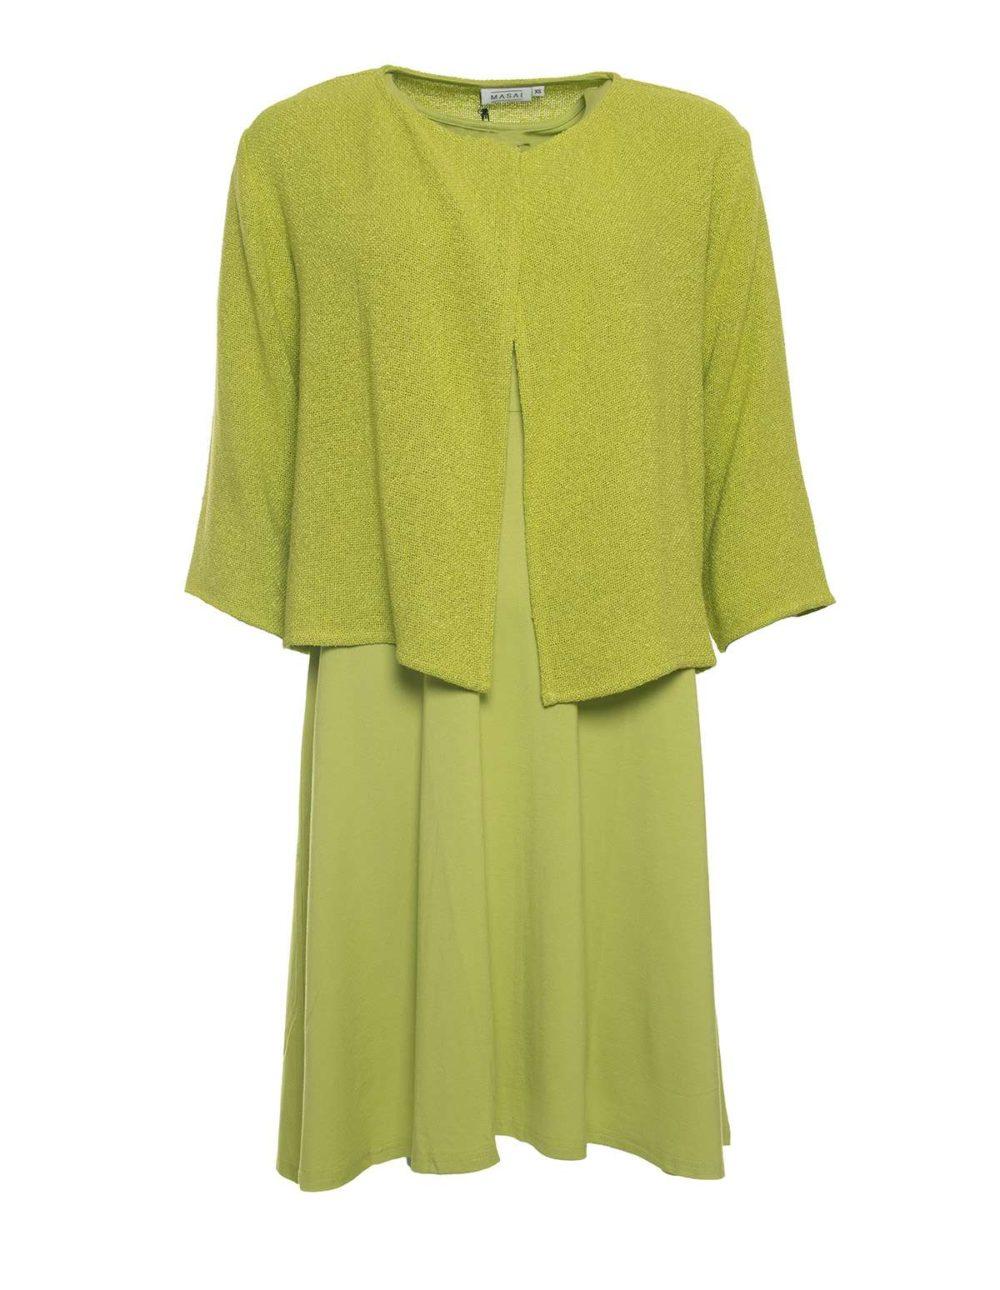 Julitta Jacket Masai Clothing Katie Kerr Women's Clothing